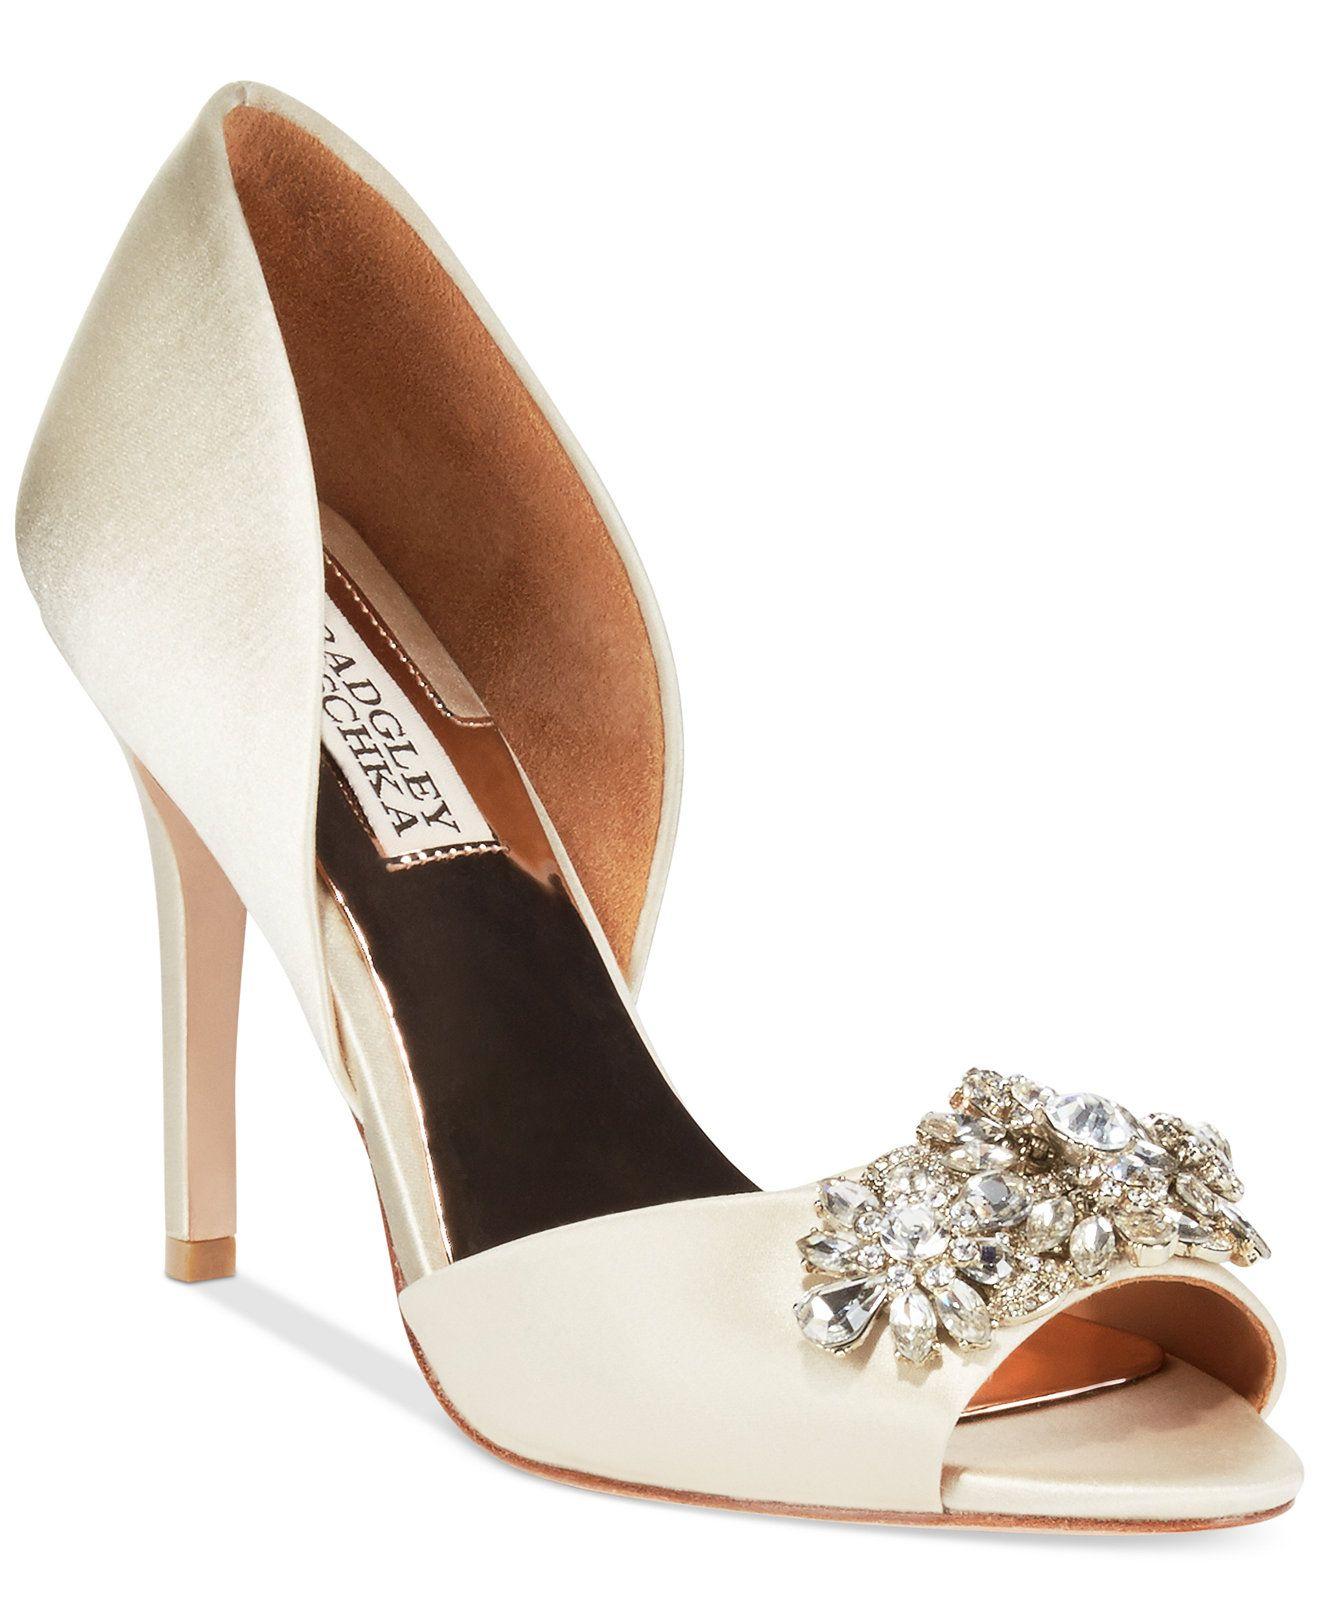 Badgley Mischka Giana Evening Pumps Pumps Shoes Macy S Women Shoes Bridal Shoes Wedding Shoes